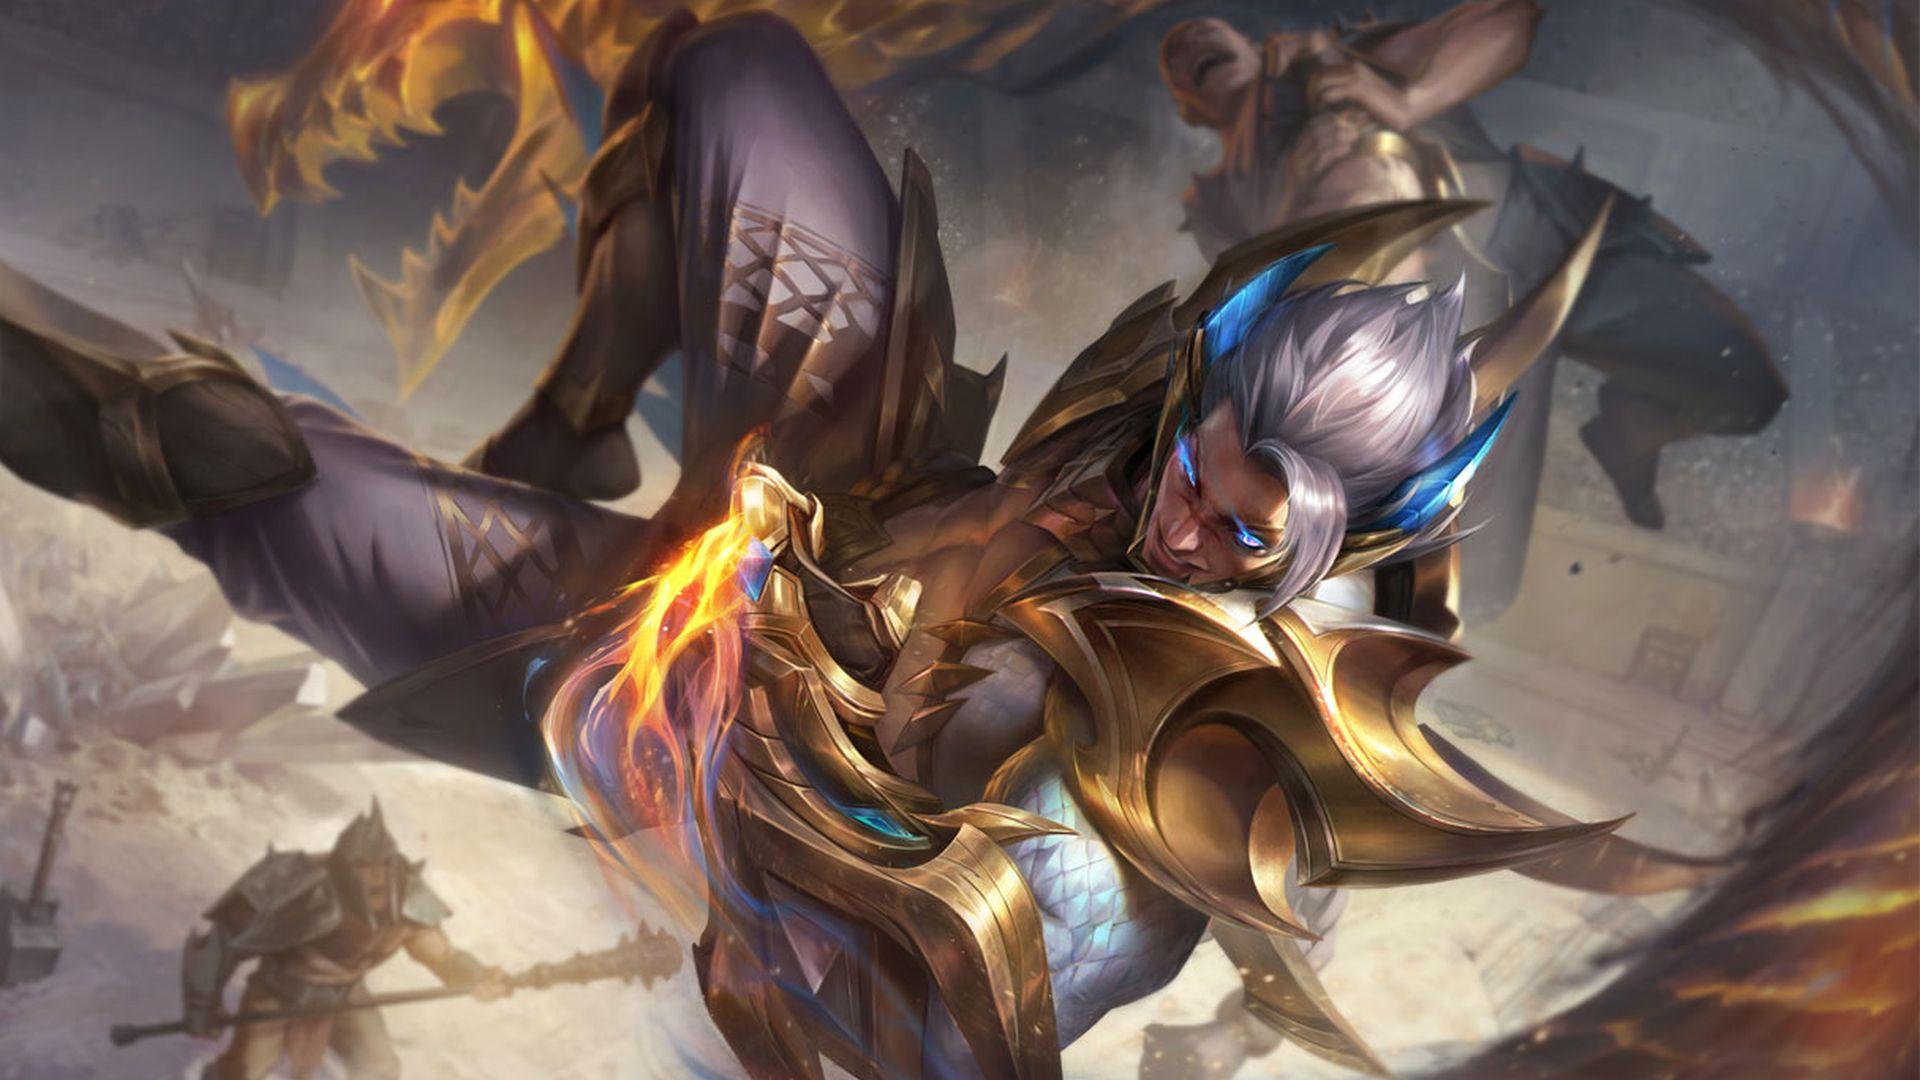 Sett is getting a Prestige Dragonmancer skin in League Patch 10.20.